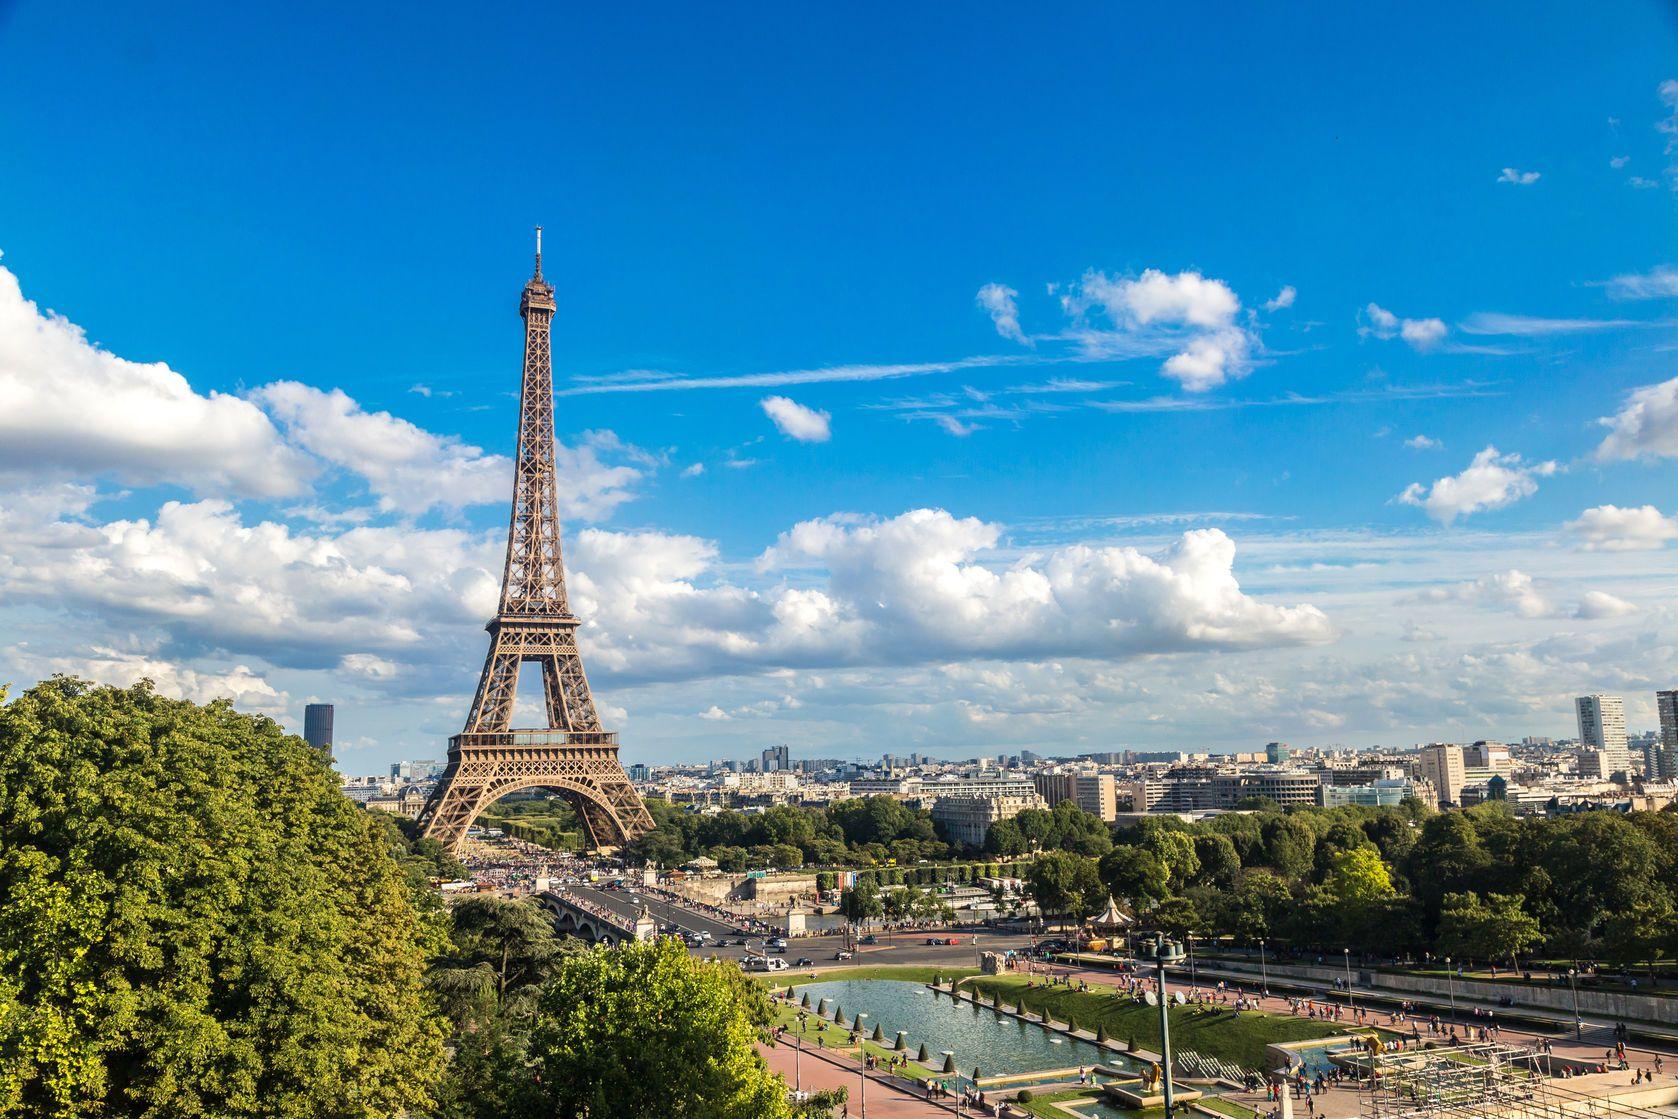 Letecký pohled na Eiffelovu věž v Paříži | bloodua/123RF.com